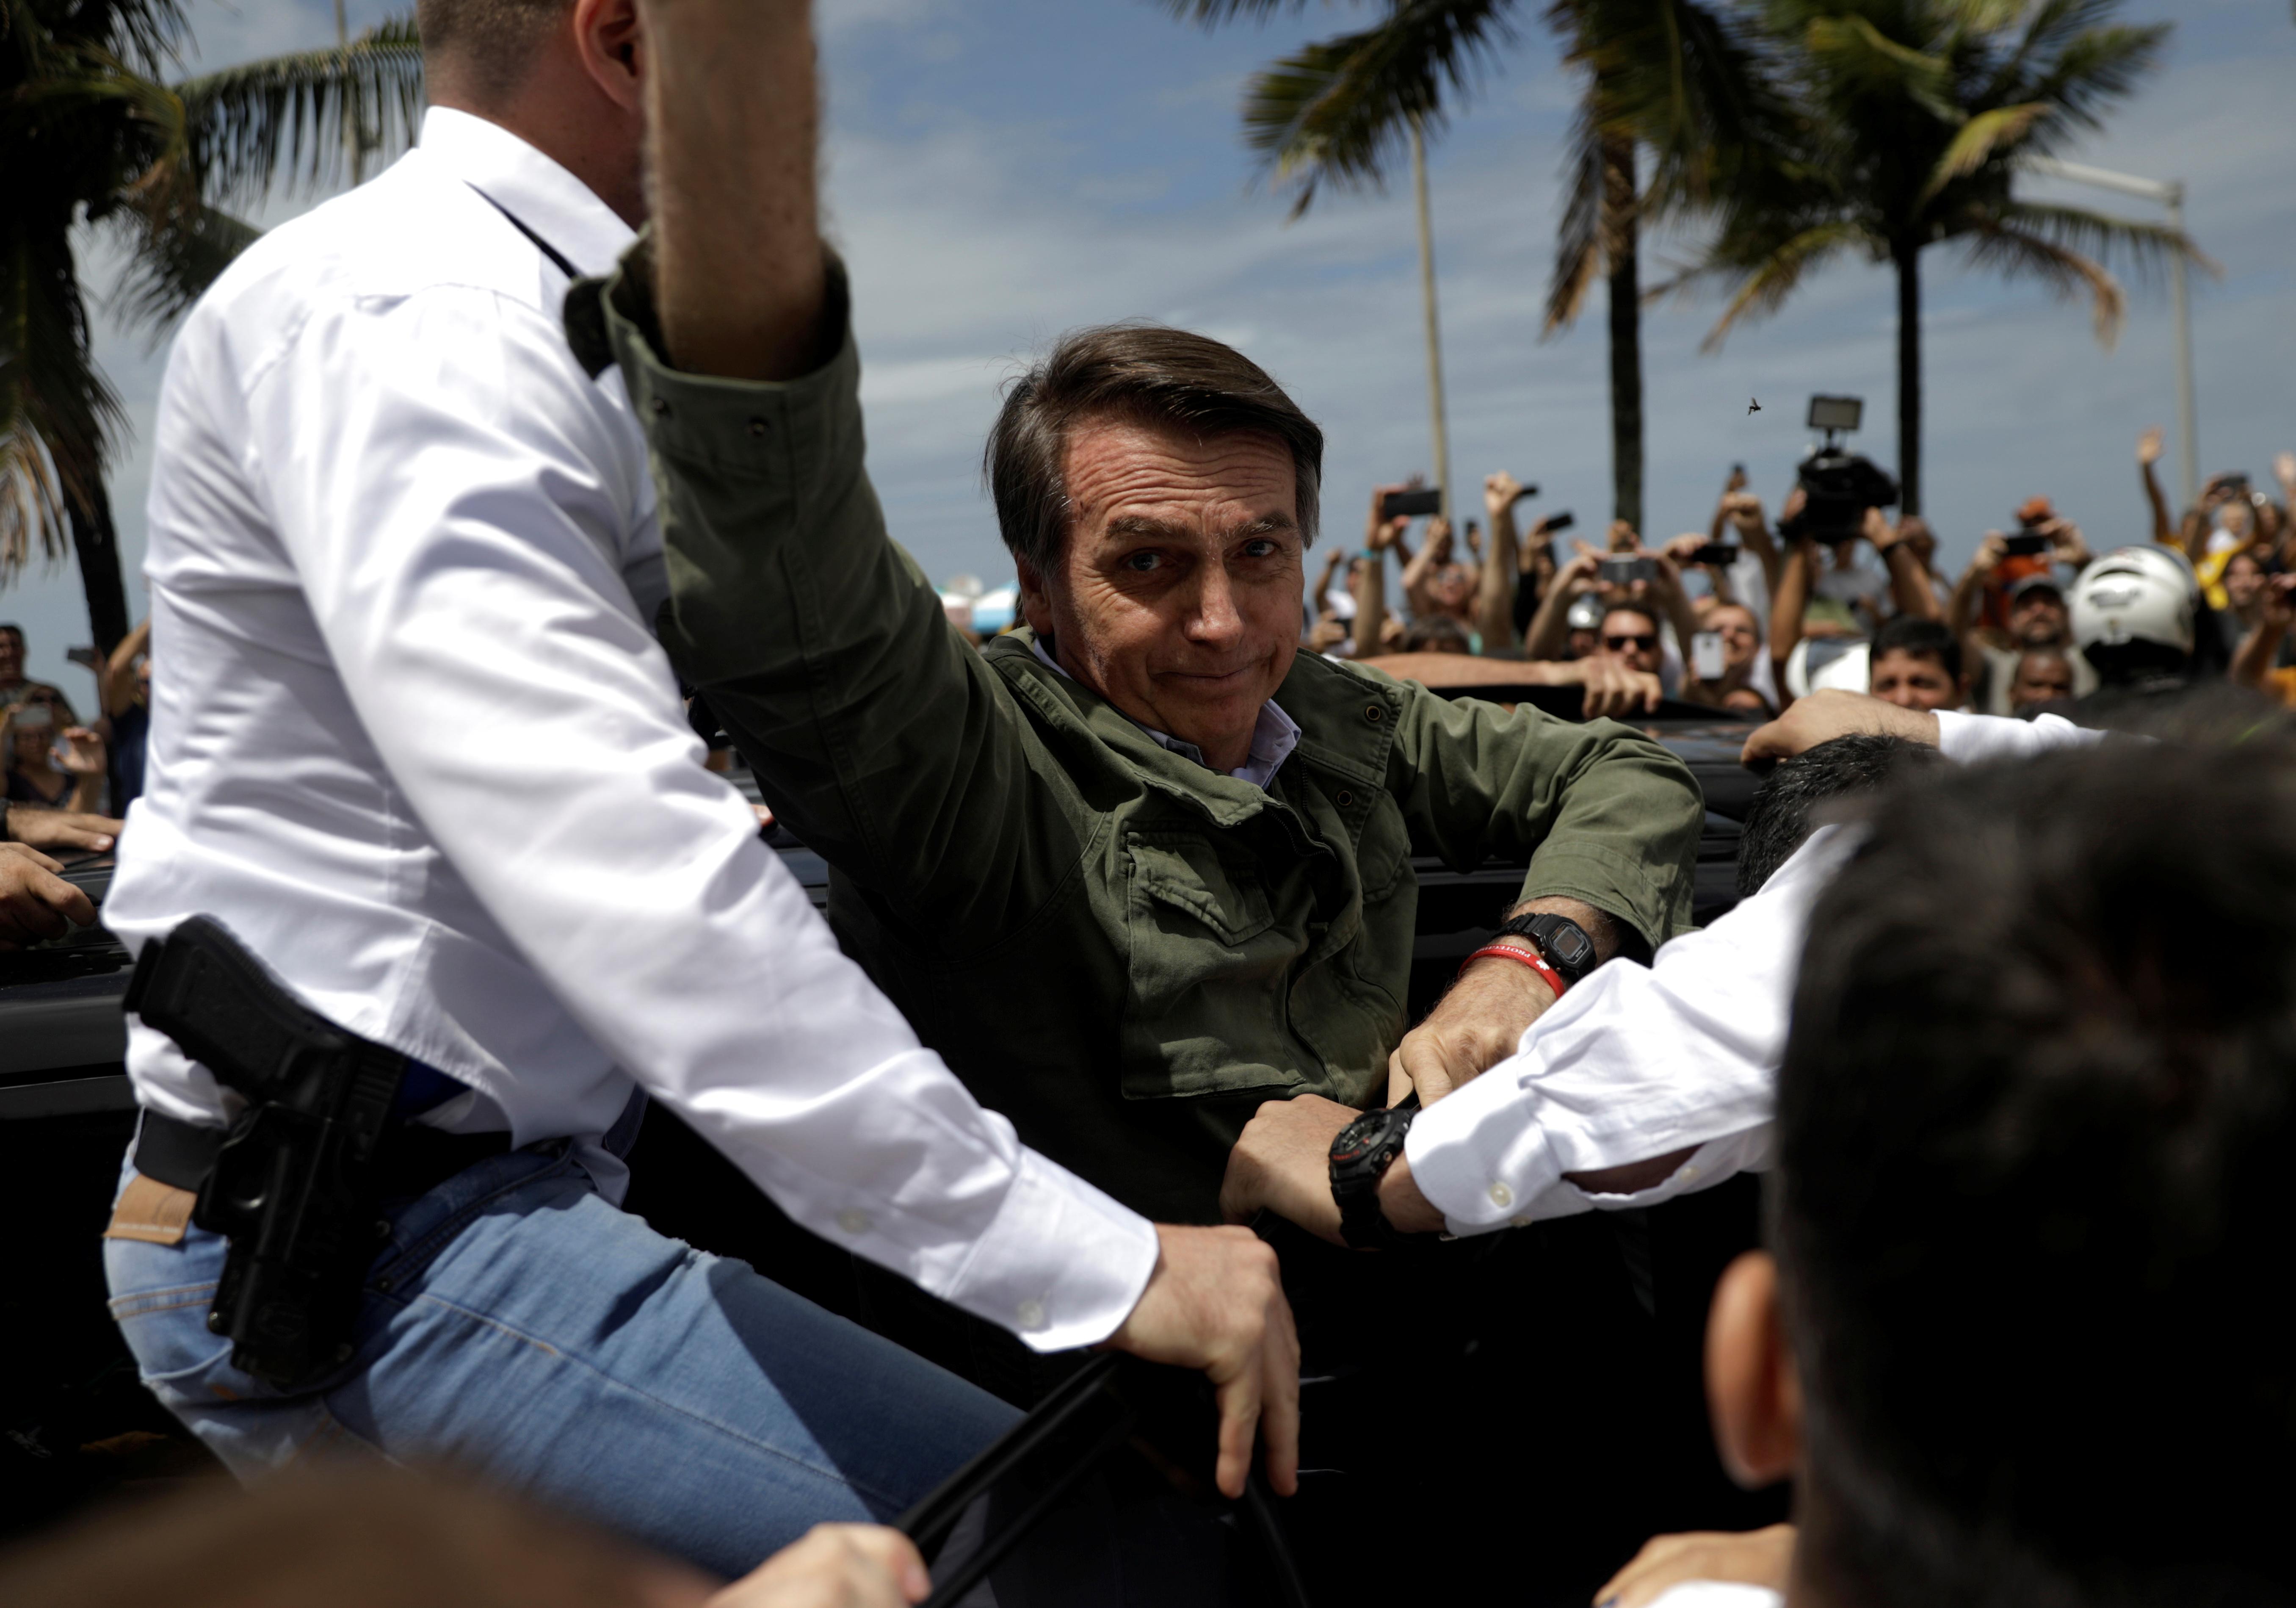 El exmilitar Jair Bolsonaro gana la presidencia en Brasil